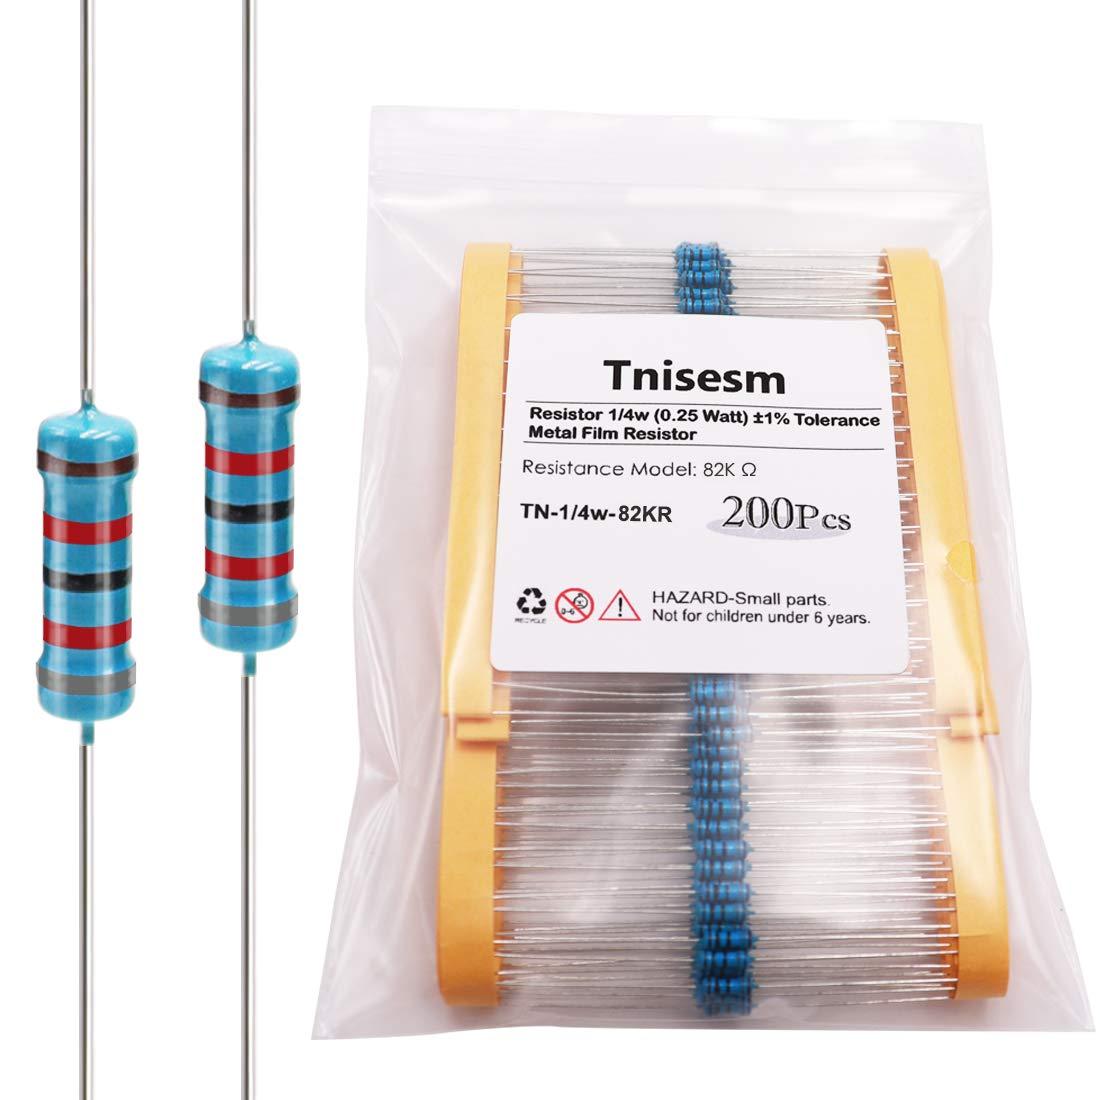 Tnisesm 200Pcs Resistor 82K ohm 1/4W (0.25 Watt) ±1% Tolerance Metal Film Resistor for DIY Projects and Experiments, Multiple Values of Resistance Optional TN-1/4W-82KR